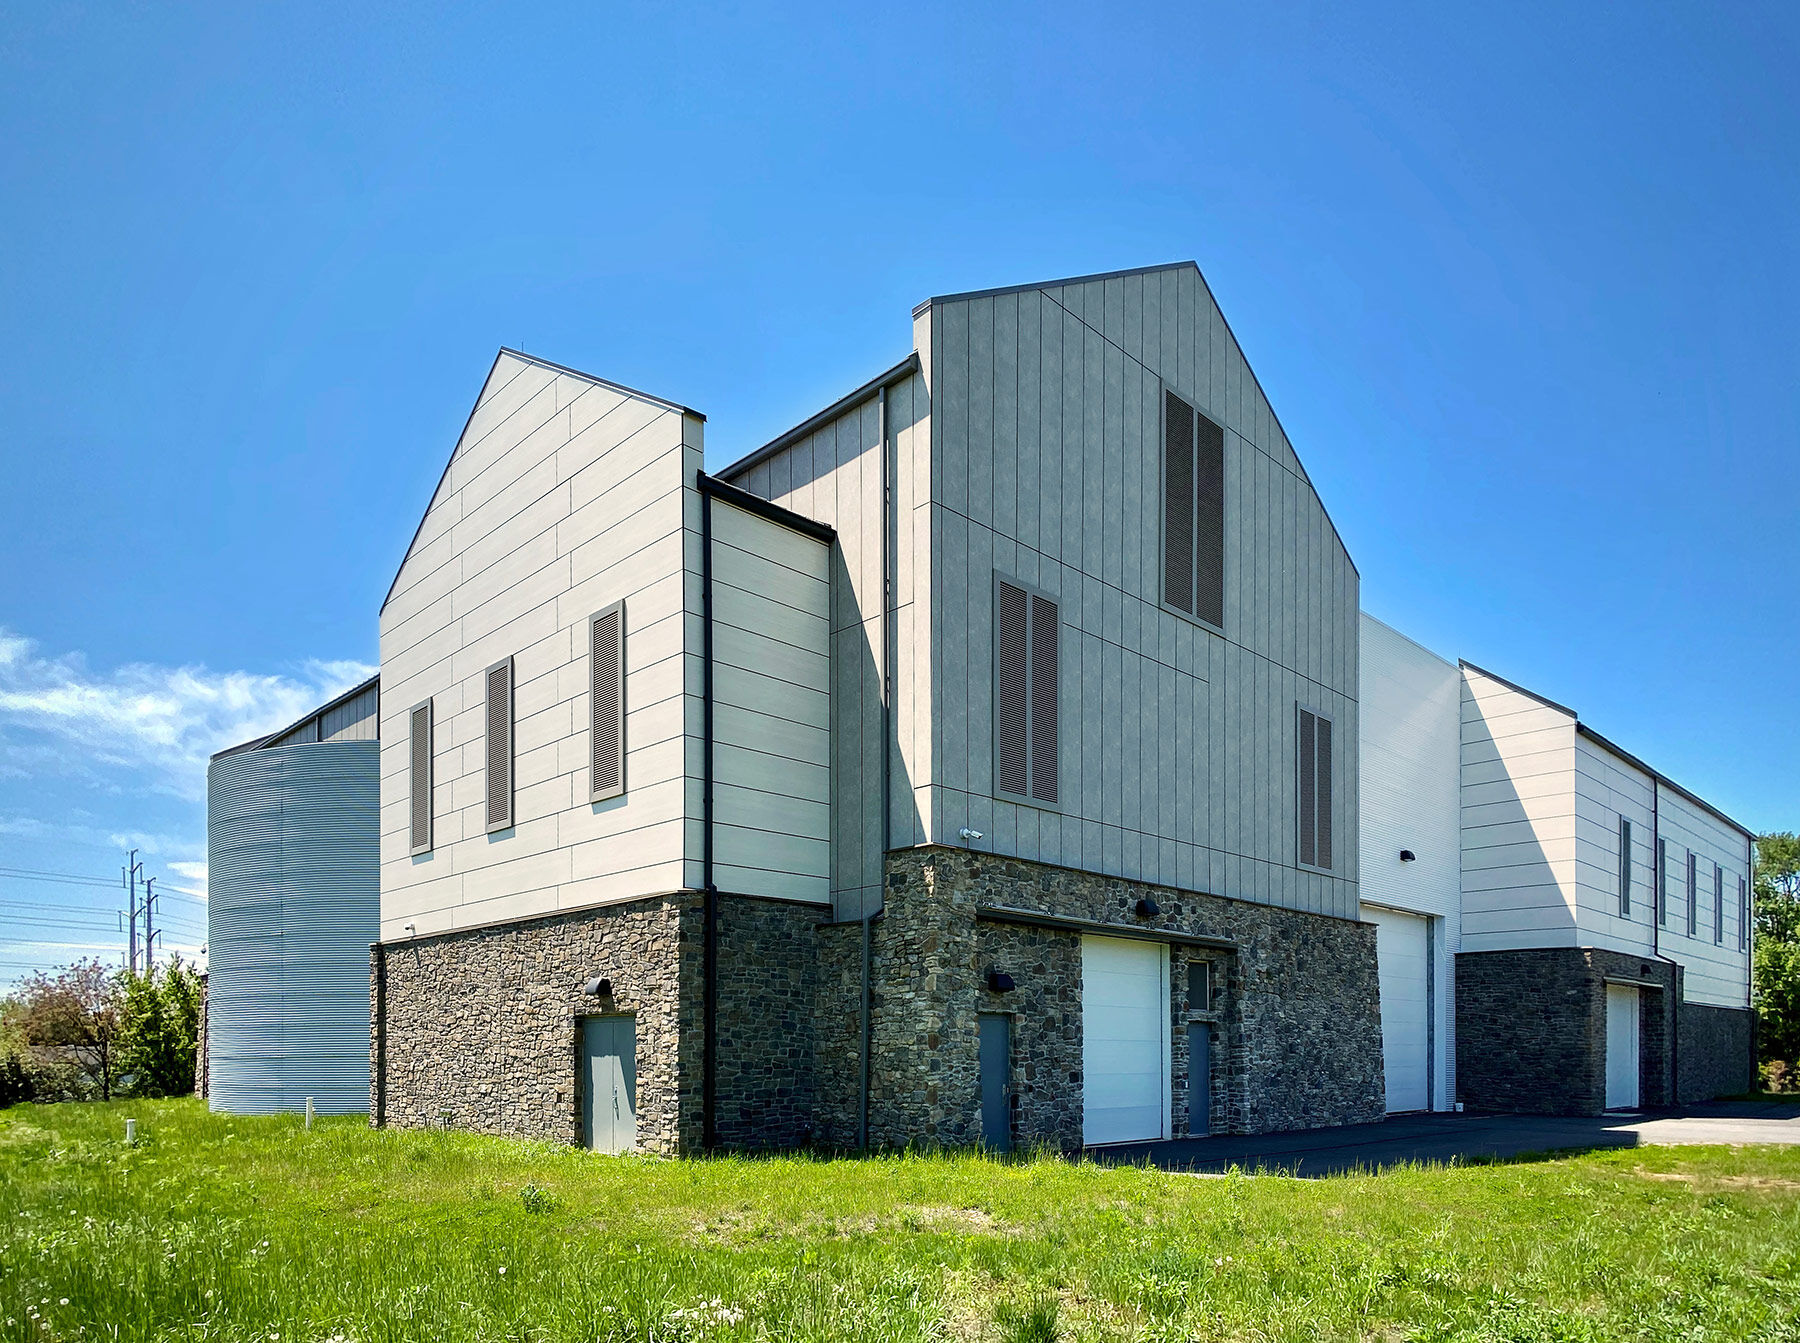 Pepco Darnestown Substation by CORE architecture + design